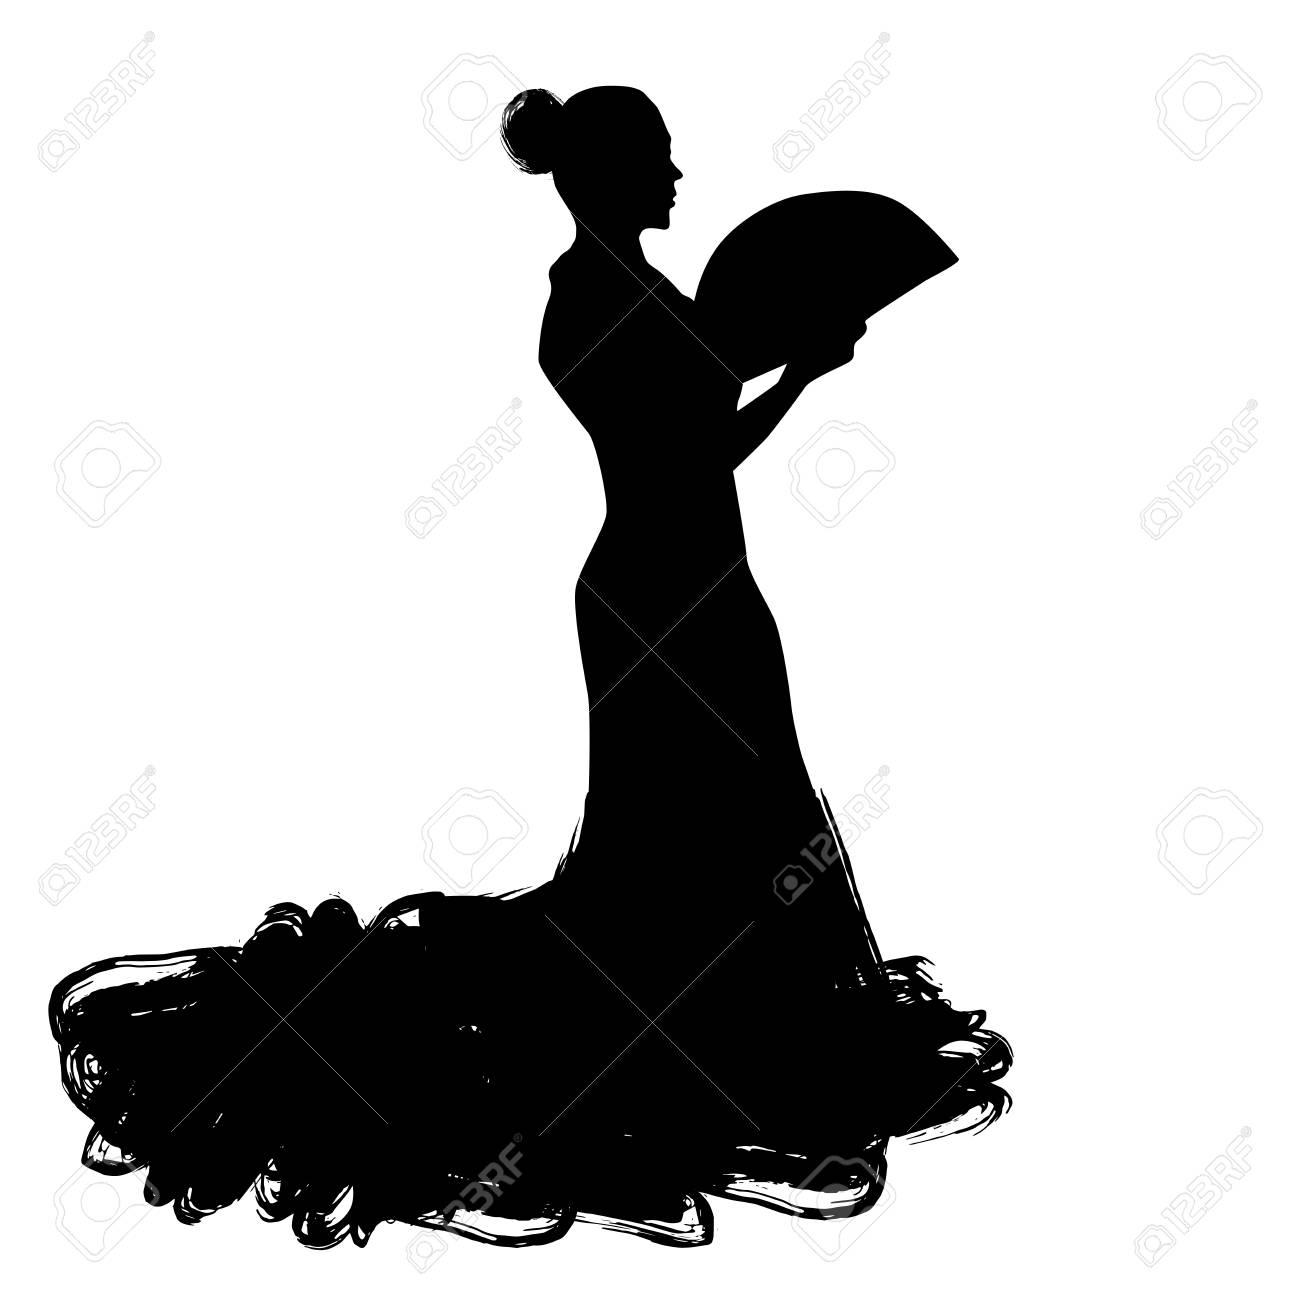 d36abe15d38d Woman With Fan In Long Dress Stay In Dancing Pose. Flamenco Dancer ...